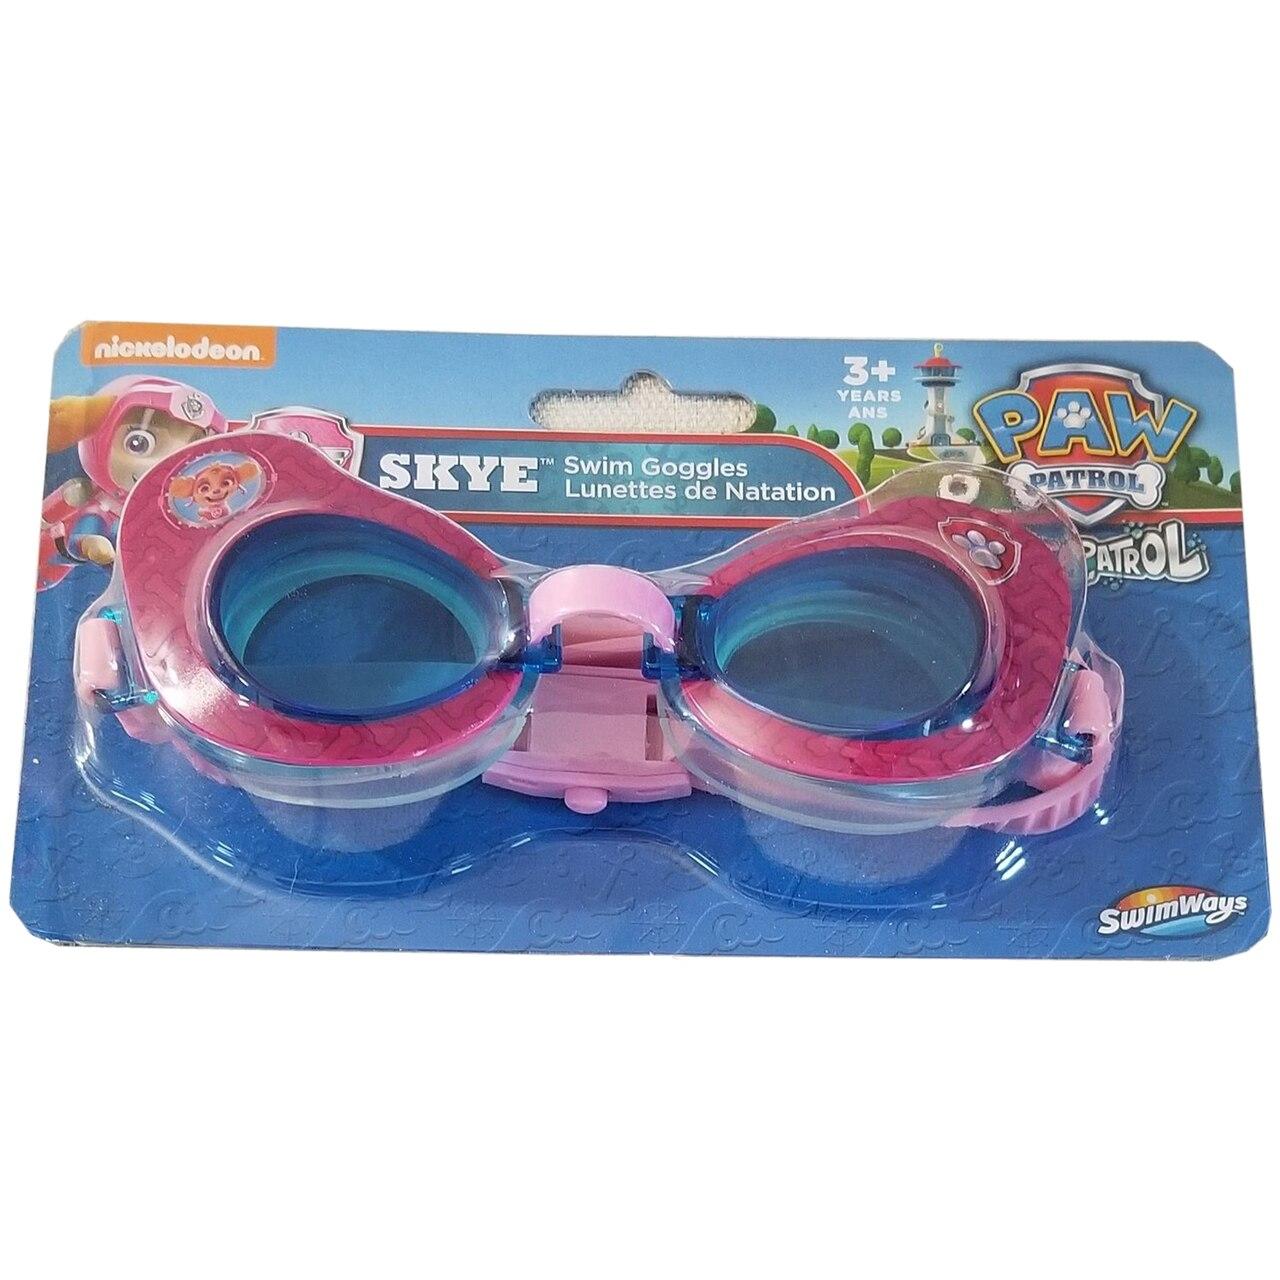 PAW PATROL Kids Swimming Goggles Boys Girls Summer Beach Pool Play Junior Gift